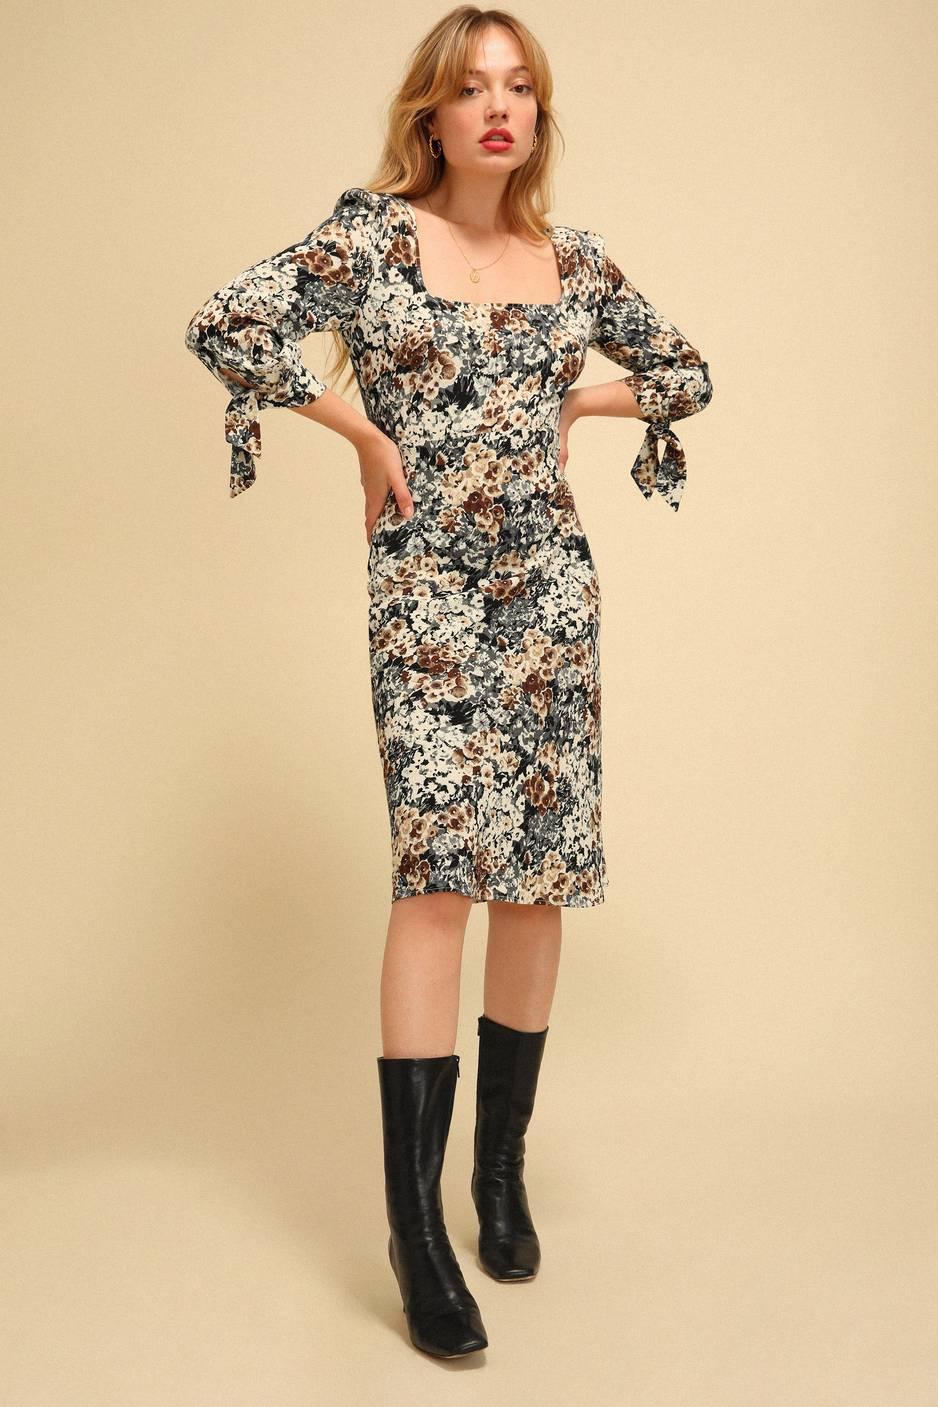 MICHAELA dress